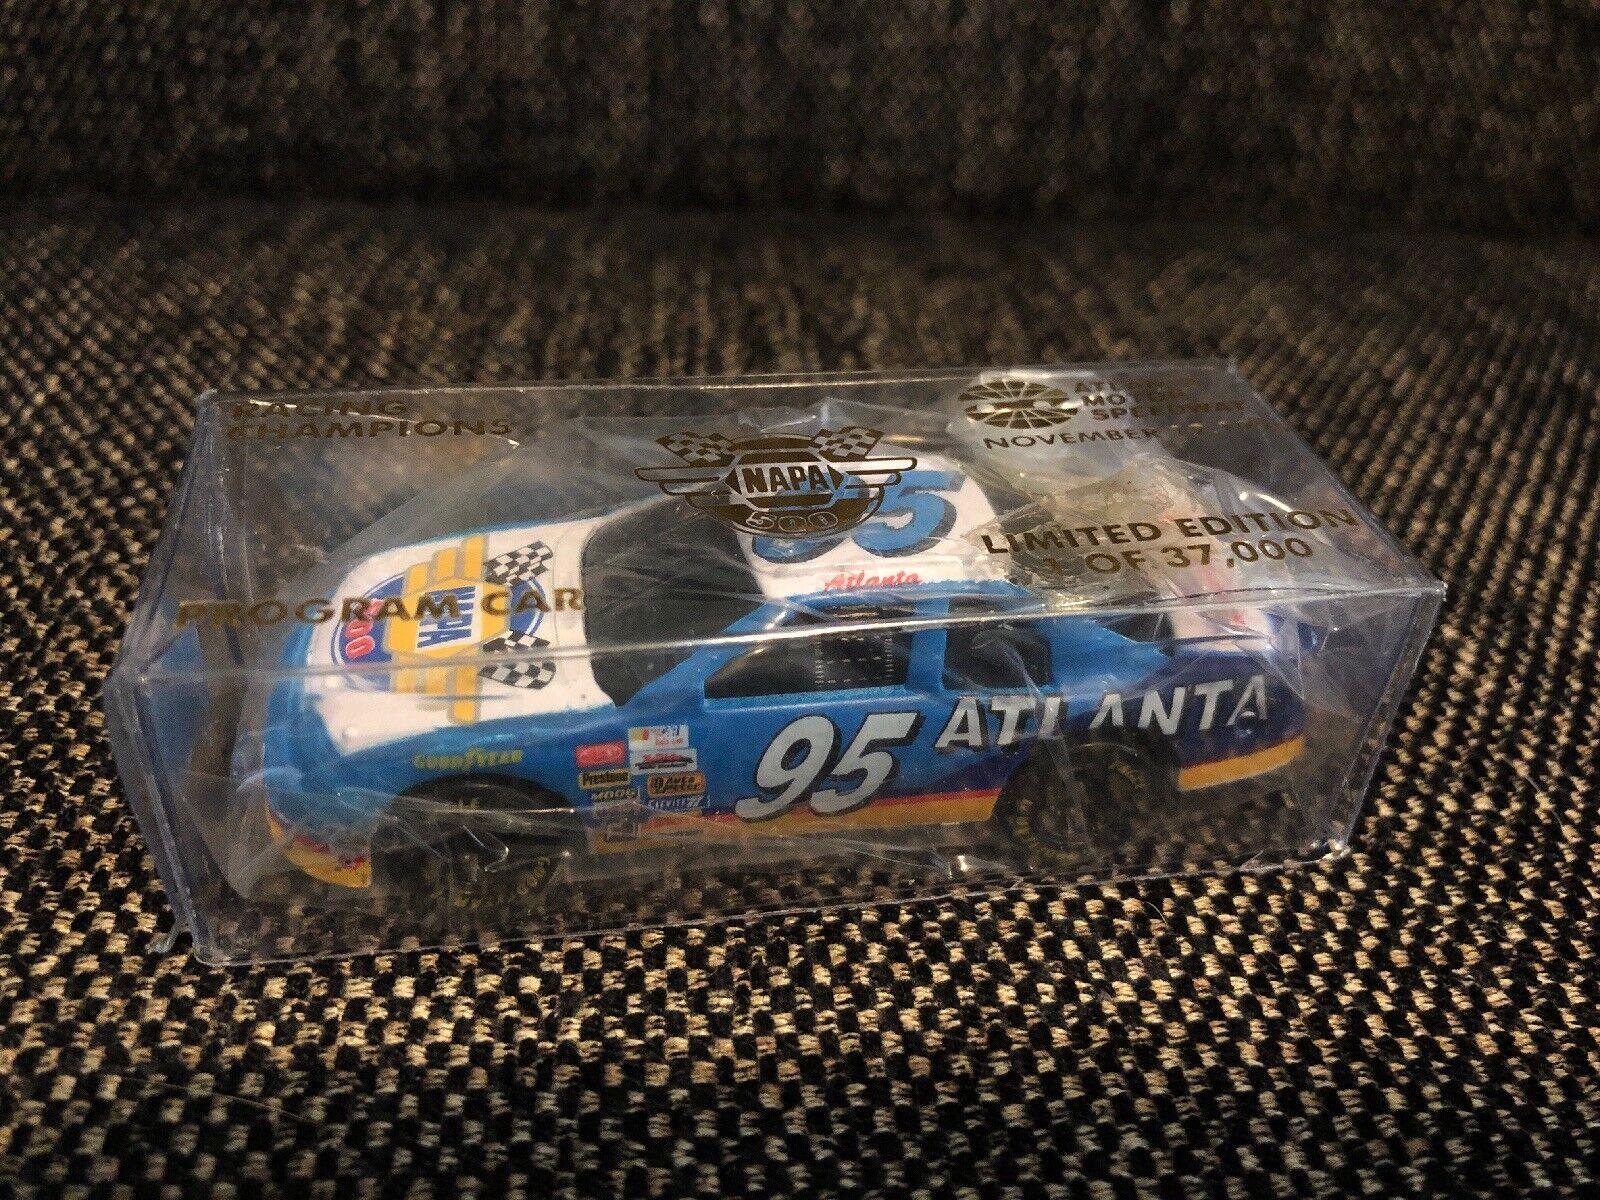 NAPA Racing Champion Program Car 1 64 Dicast Altanta Speedway 11-12-1995 1 37000